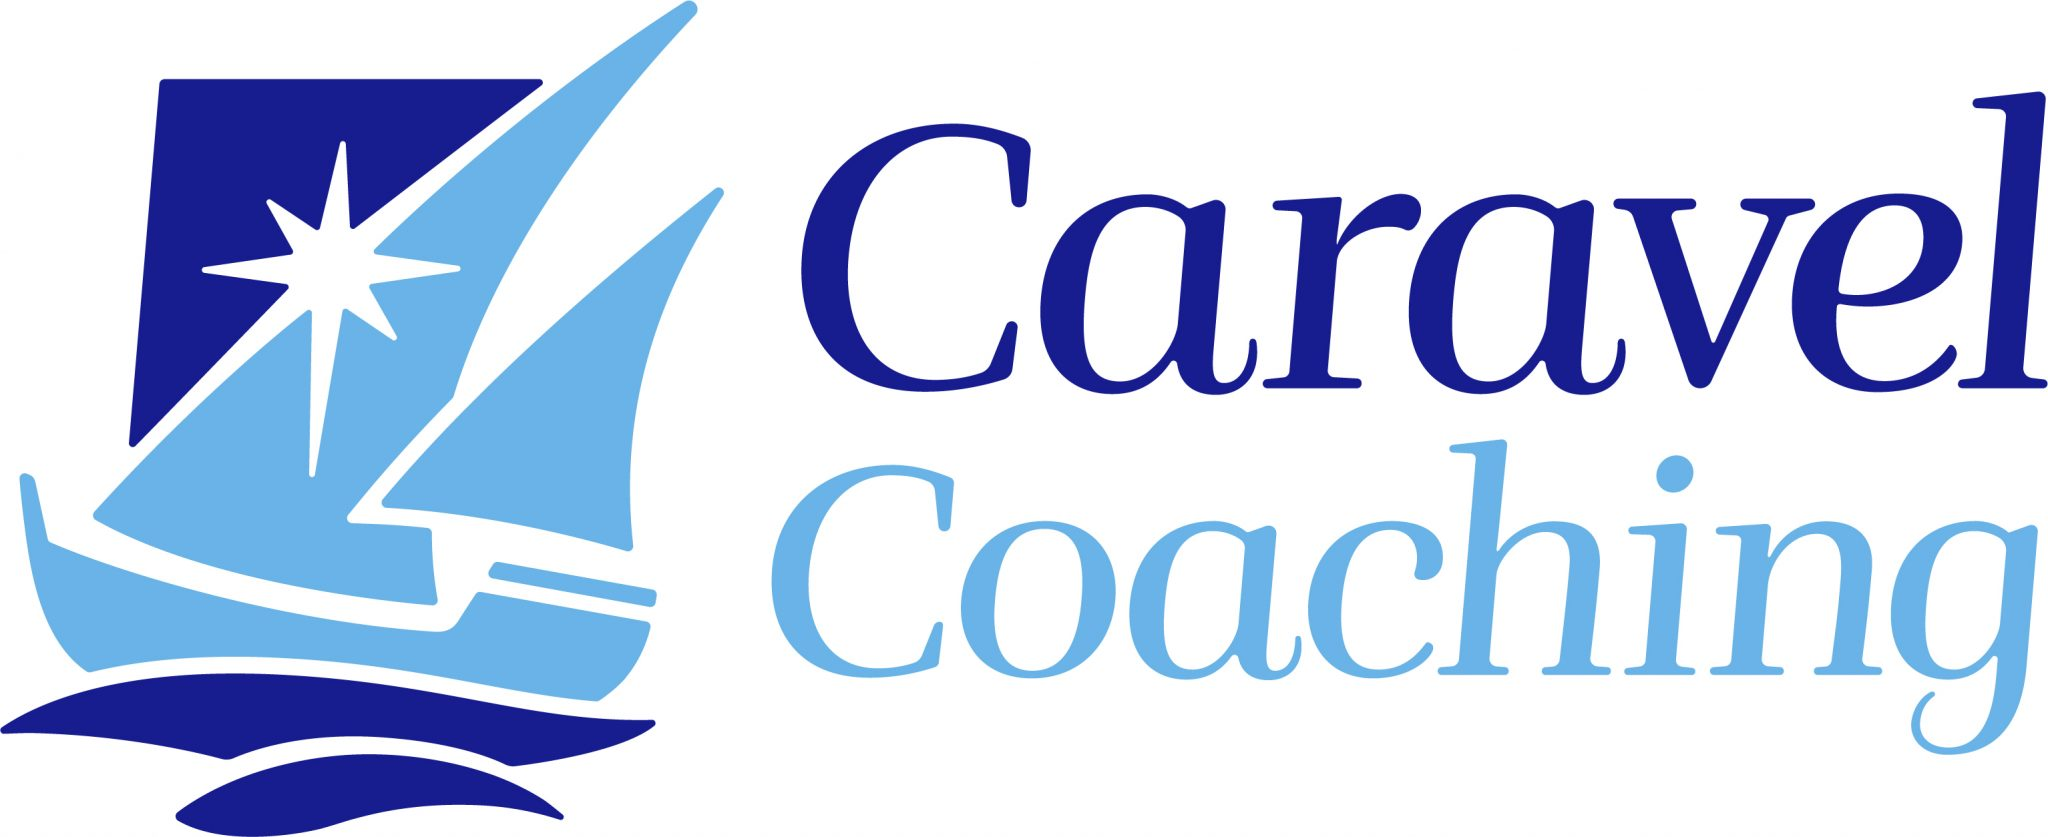 Caravel Coaching